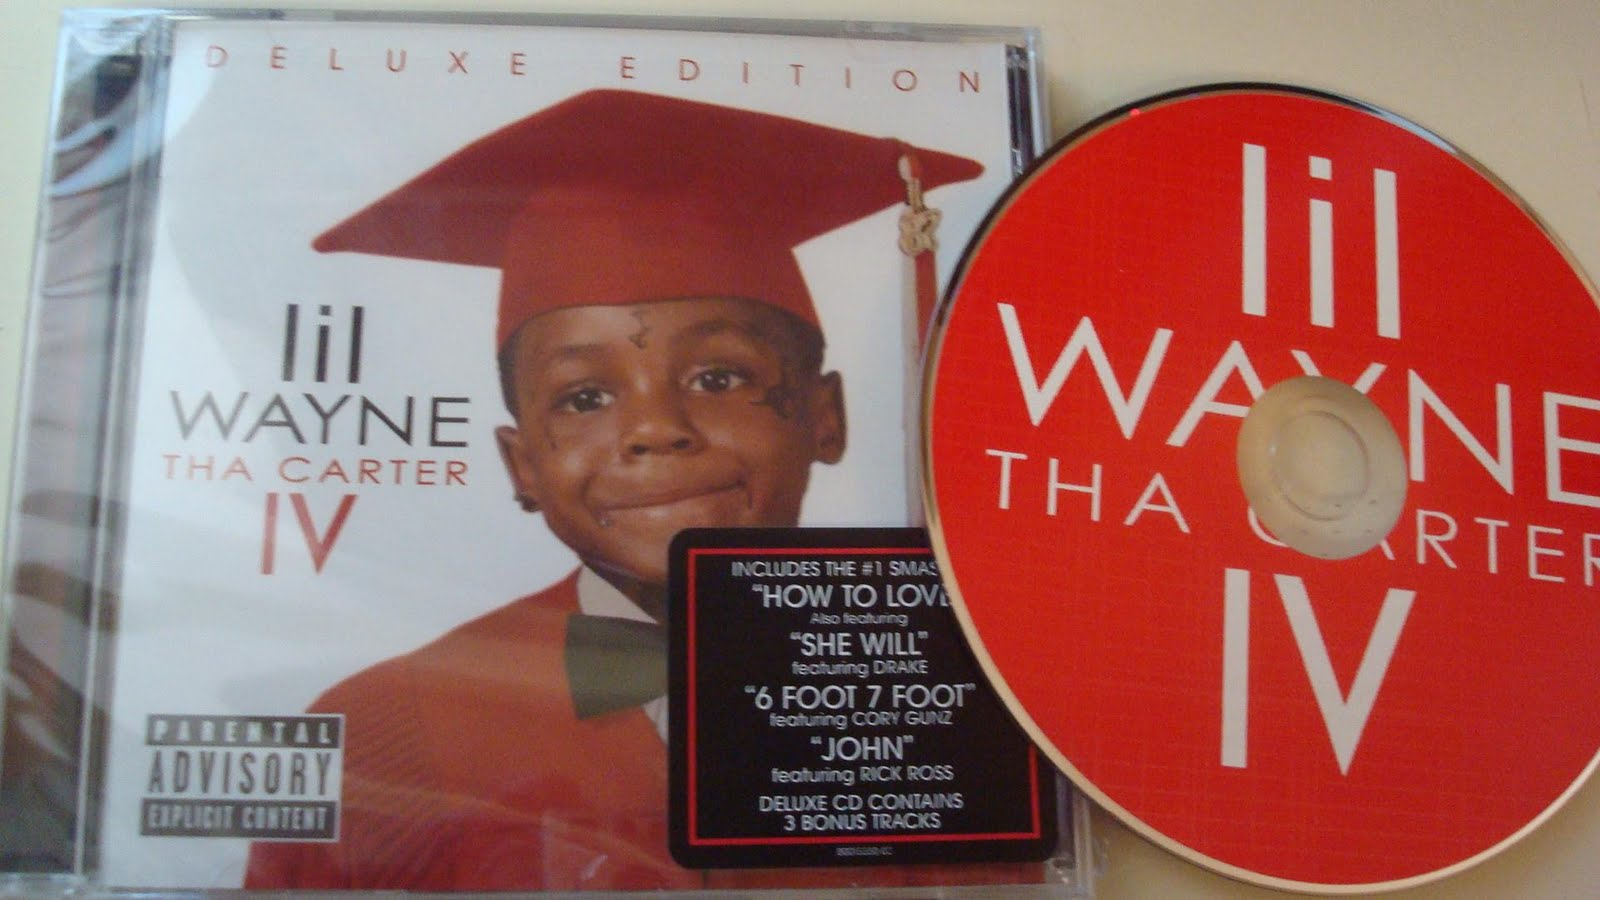 Download album: lil wayne tha carter iii (zip file)   hiphopde.